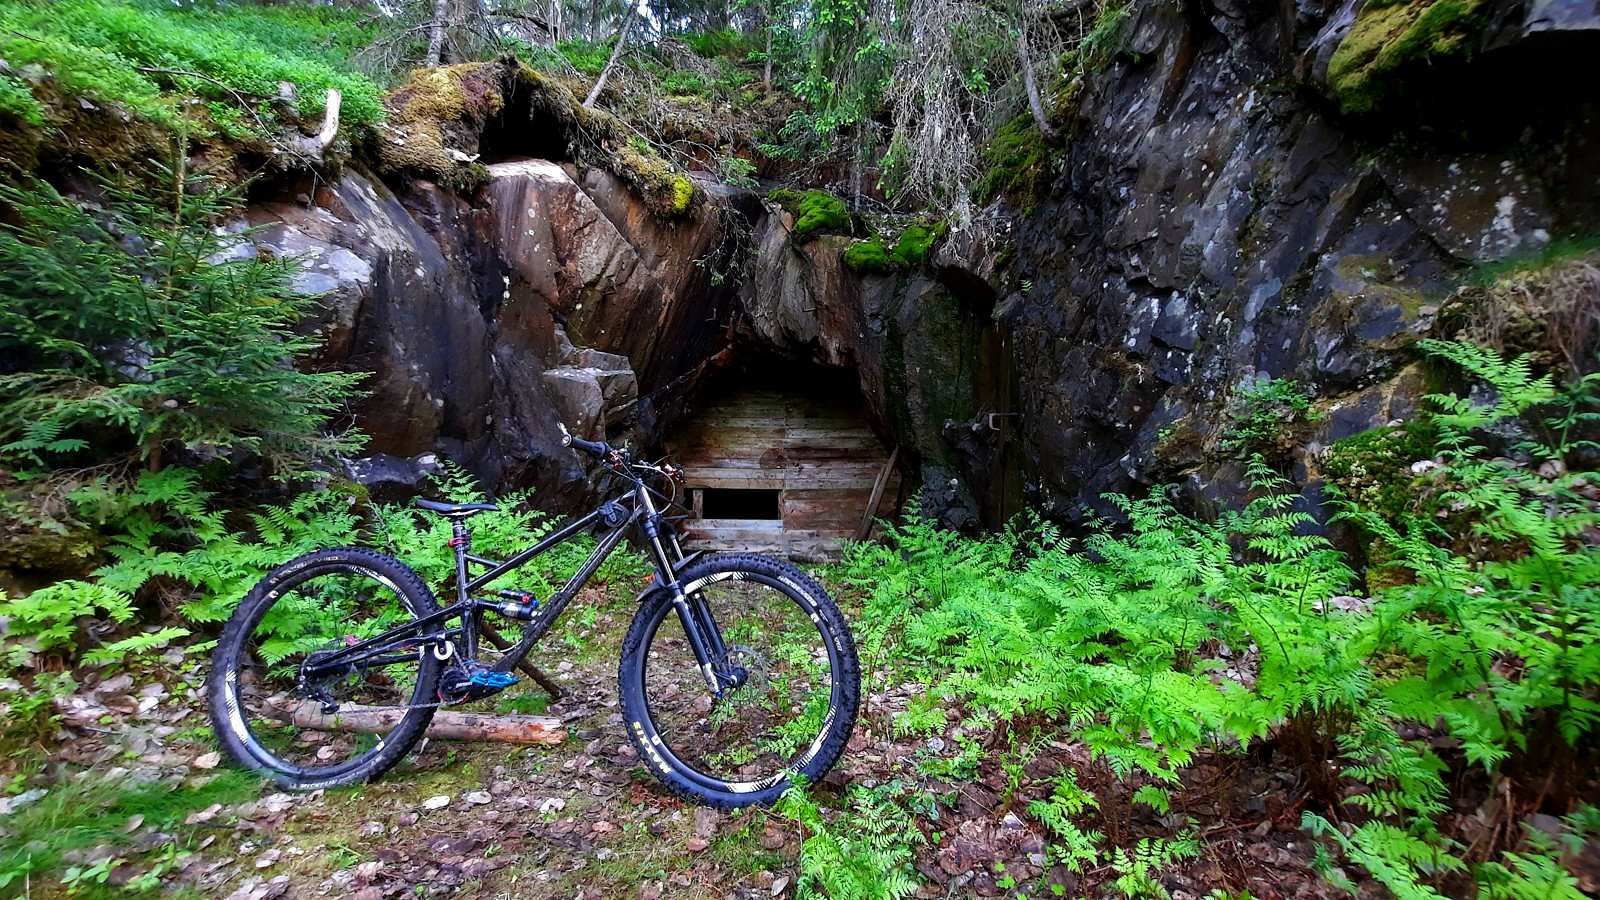 IMG 20210608 205540 331 - EST - Mountain Biking Pictures - Vital MTB